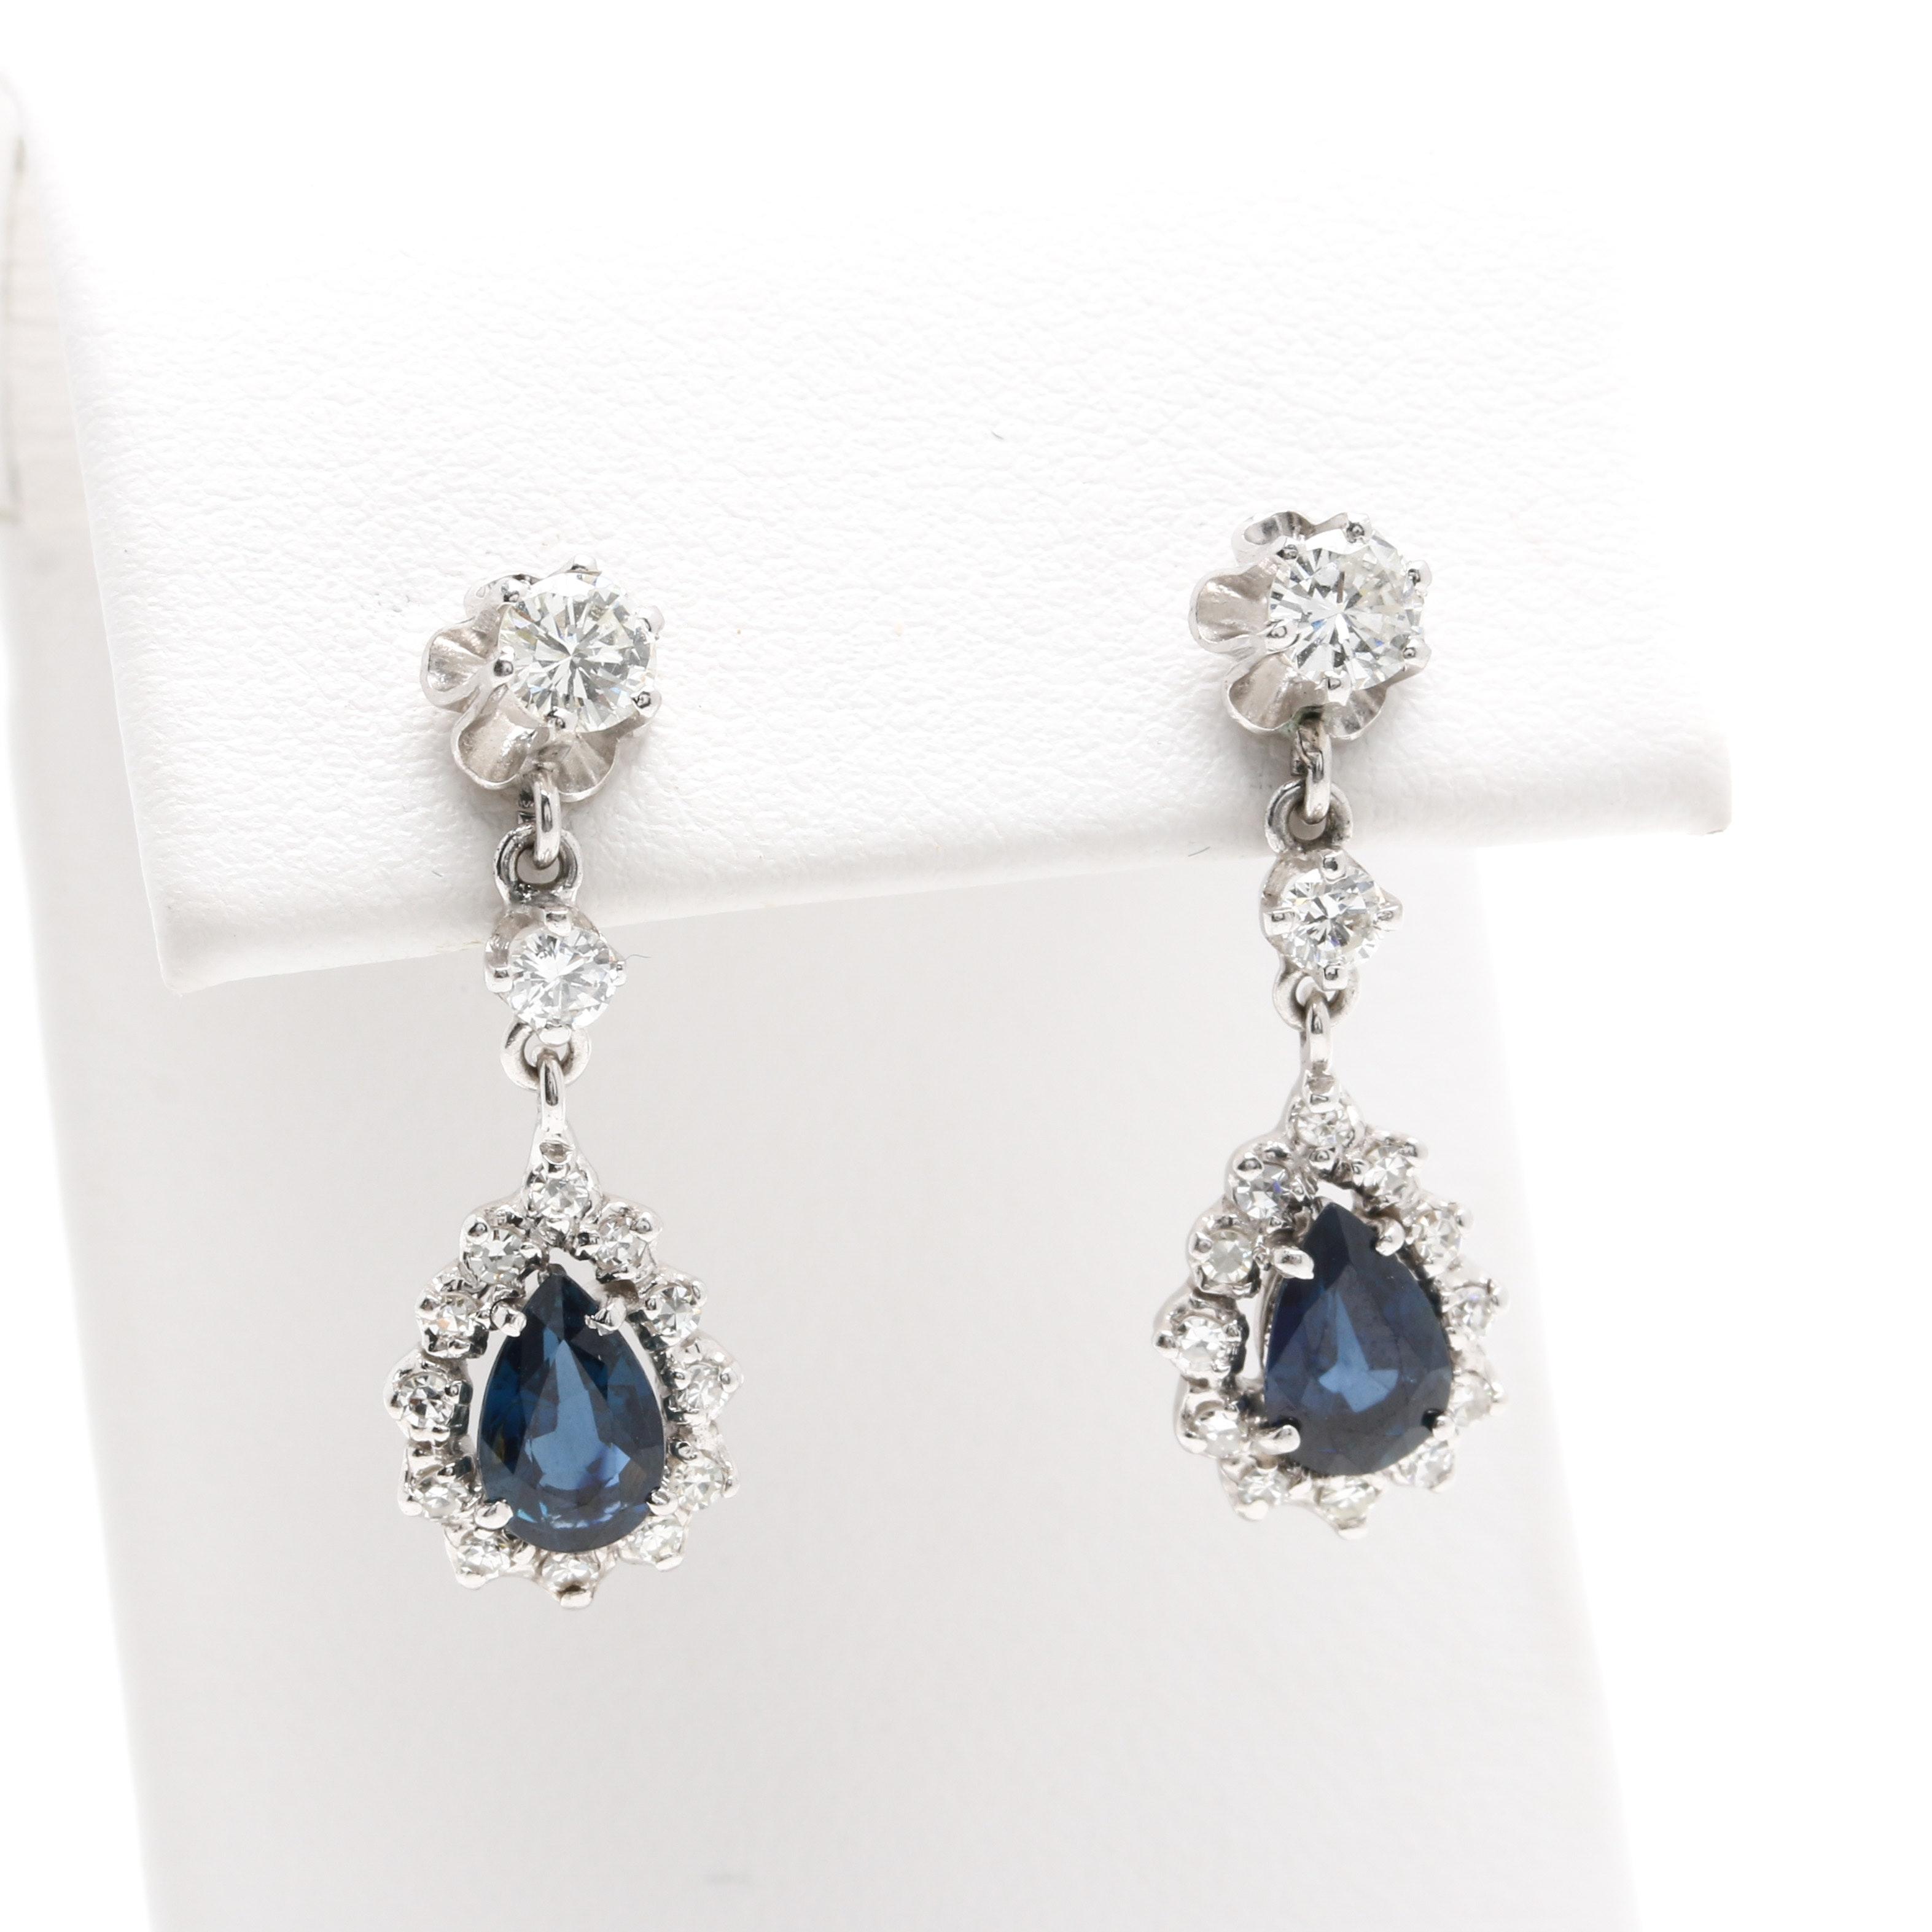 14K White Gold Sapphire and Diamond Drop Earrings